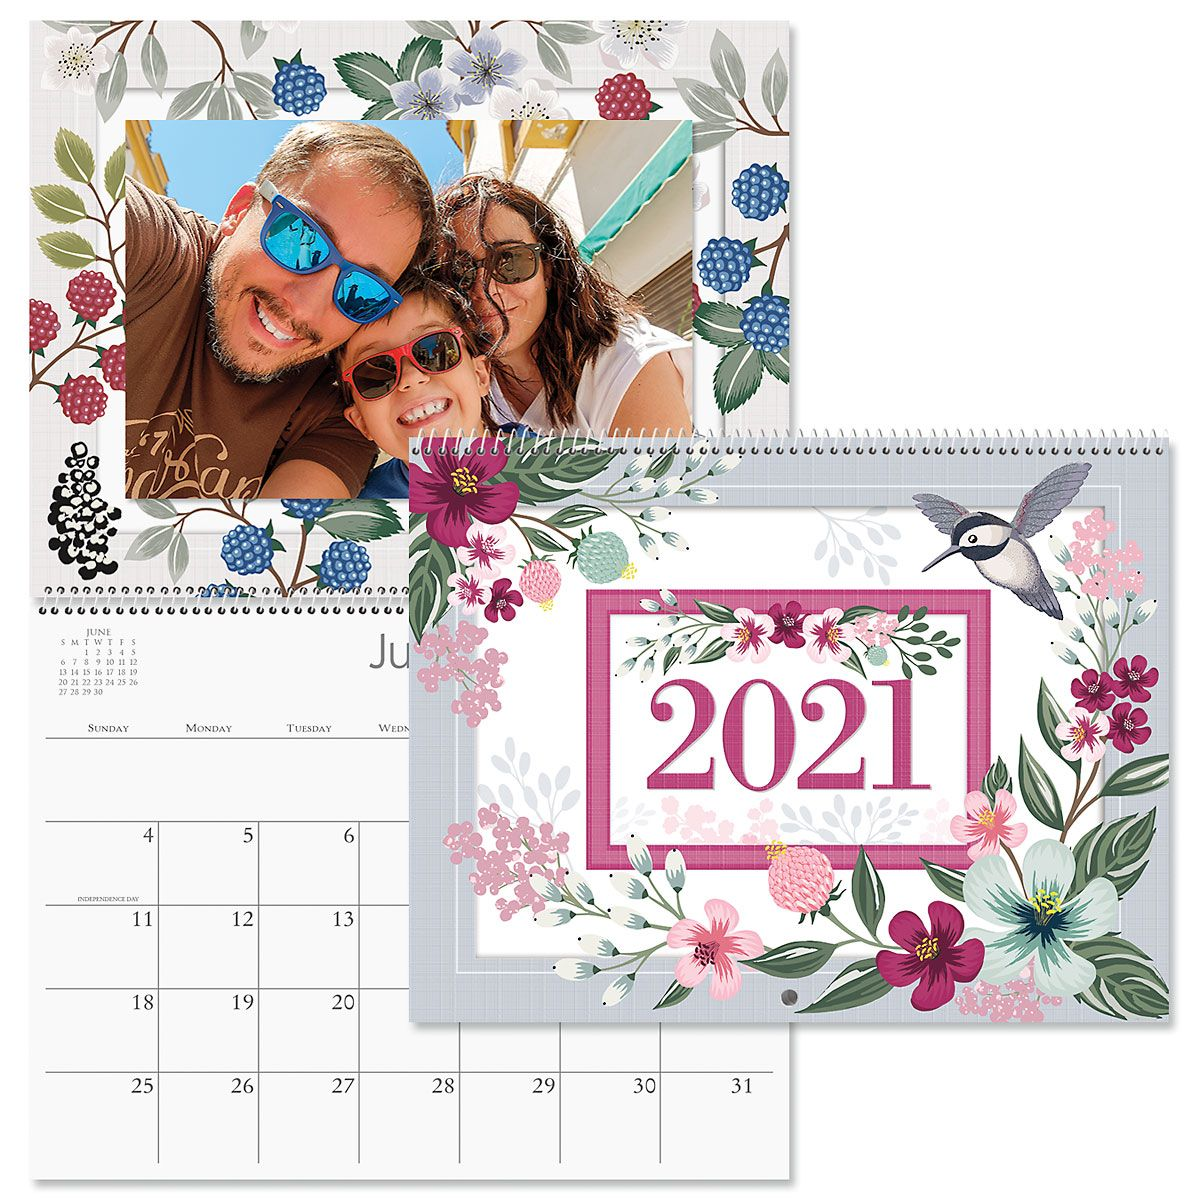 2021 Floral Scrapbooking Calendar